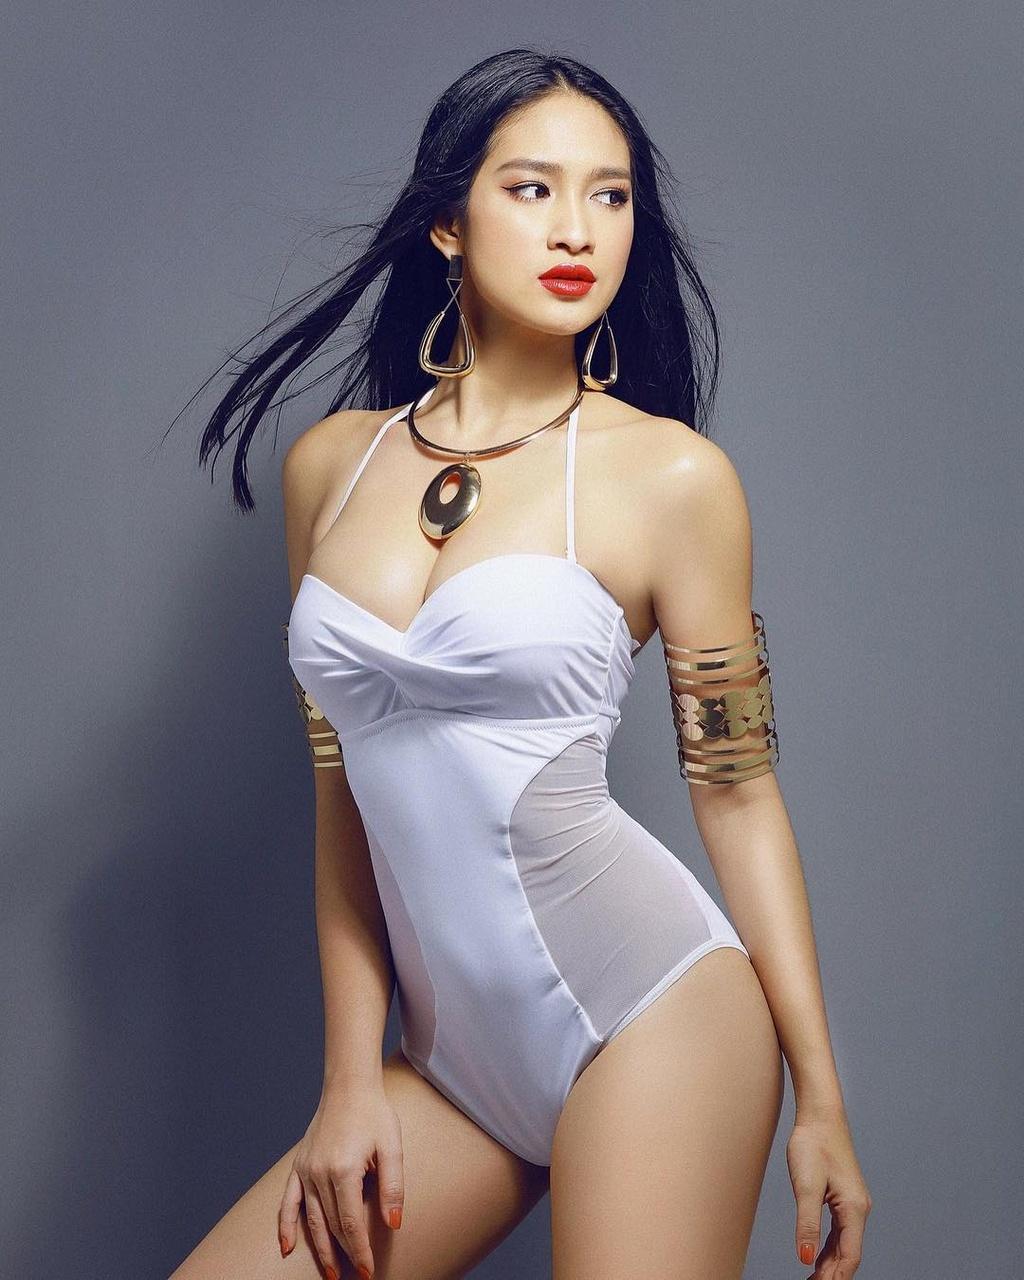 Minh Tu va nhung nguoi dep co the dang quang Hoa hau Sieu quoc gia hinh anh 2